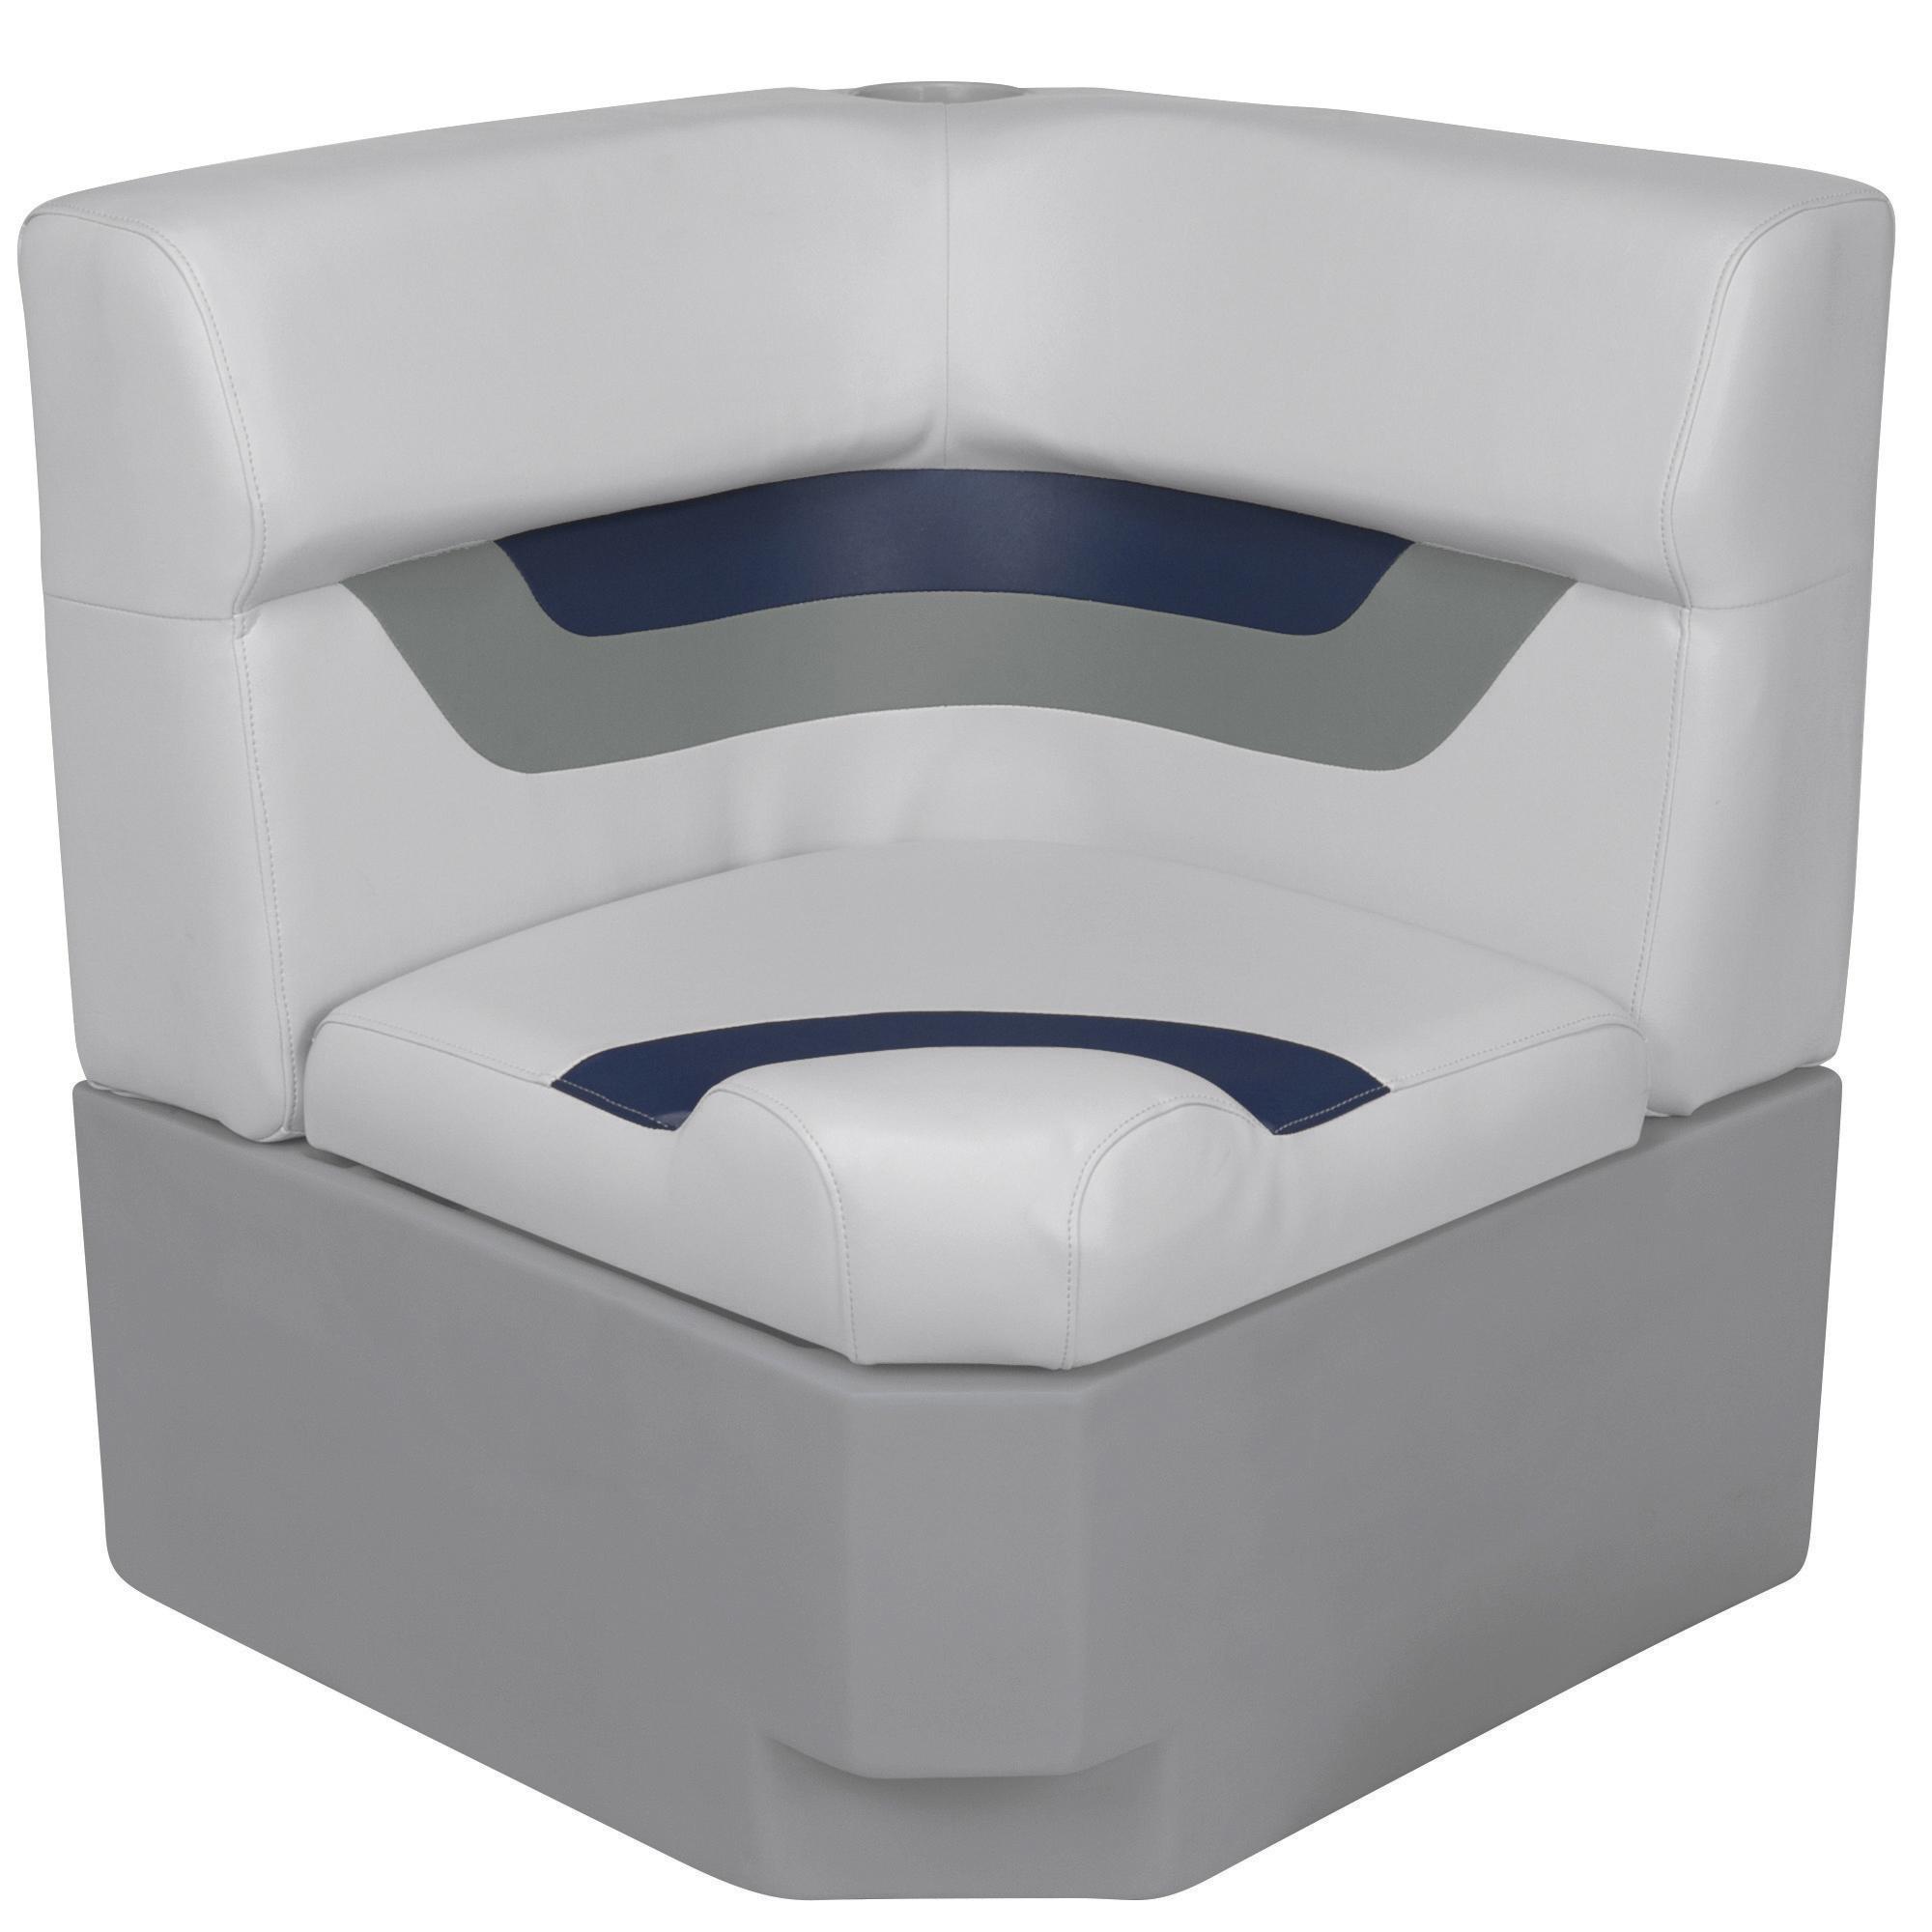 Toonmate Designer Pontoon Corner Section Seat, Sky Gray